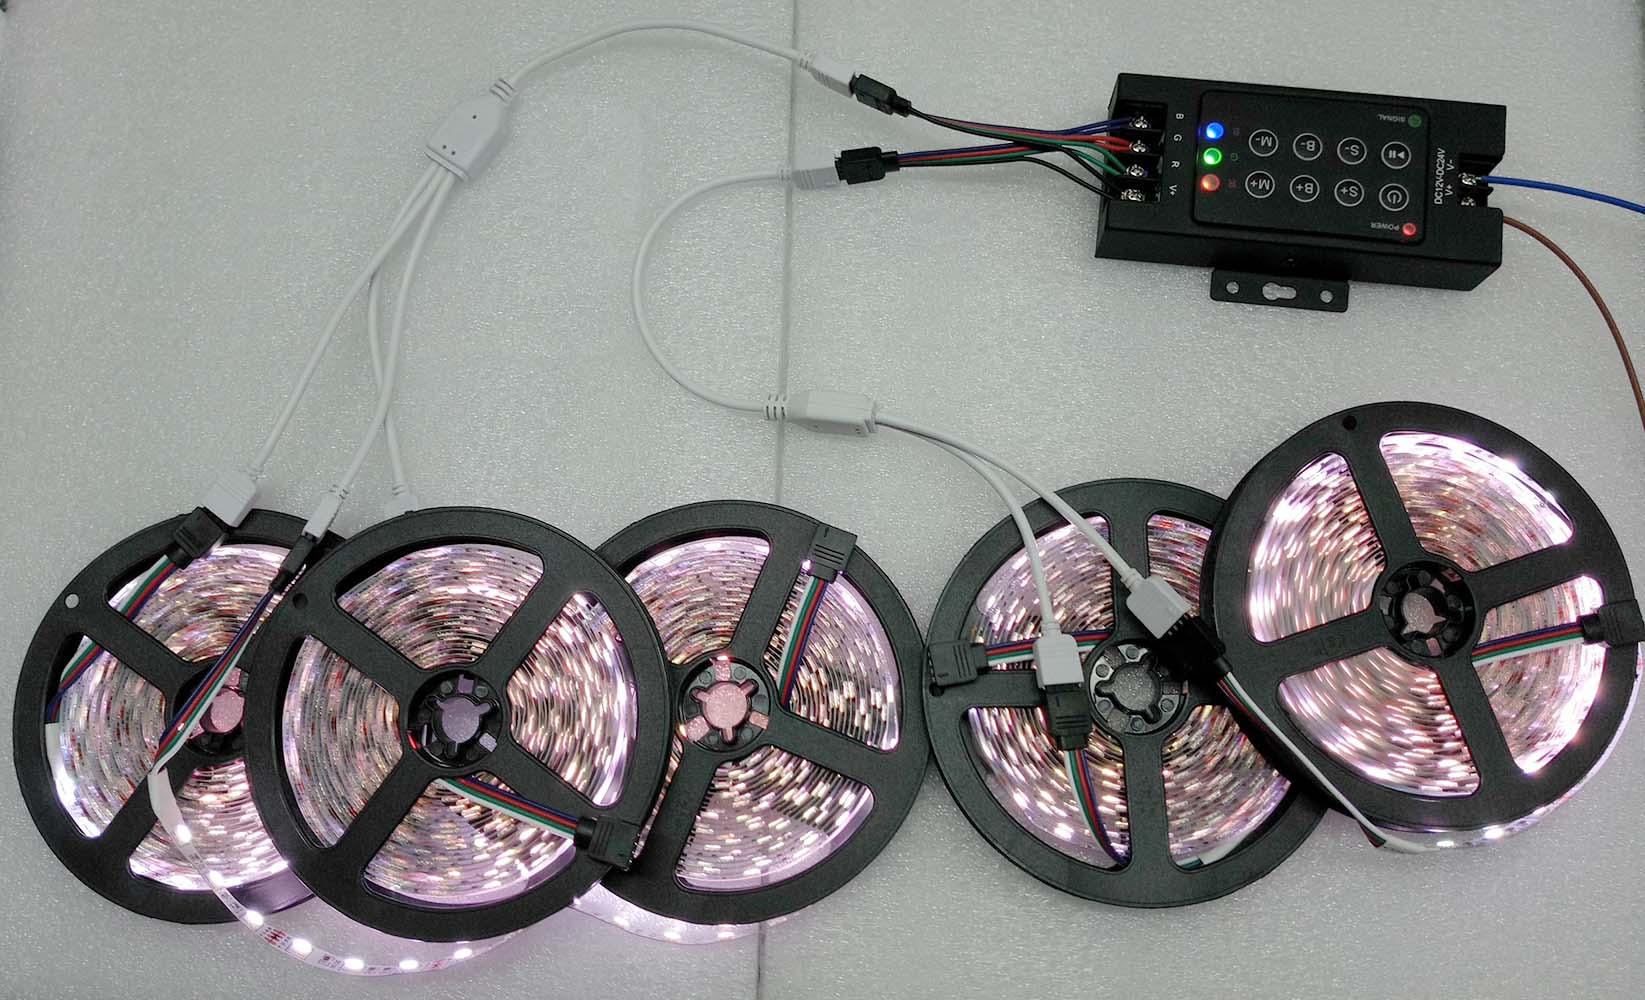 25m Waterproof Rgb Led Strip Light Smd 5050 Tape 30a Rf Remote 120v Strips Wiring Diagram 5 Roll 60leds M